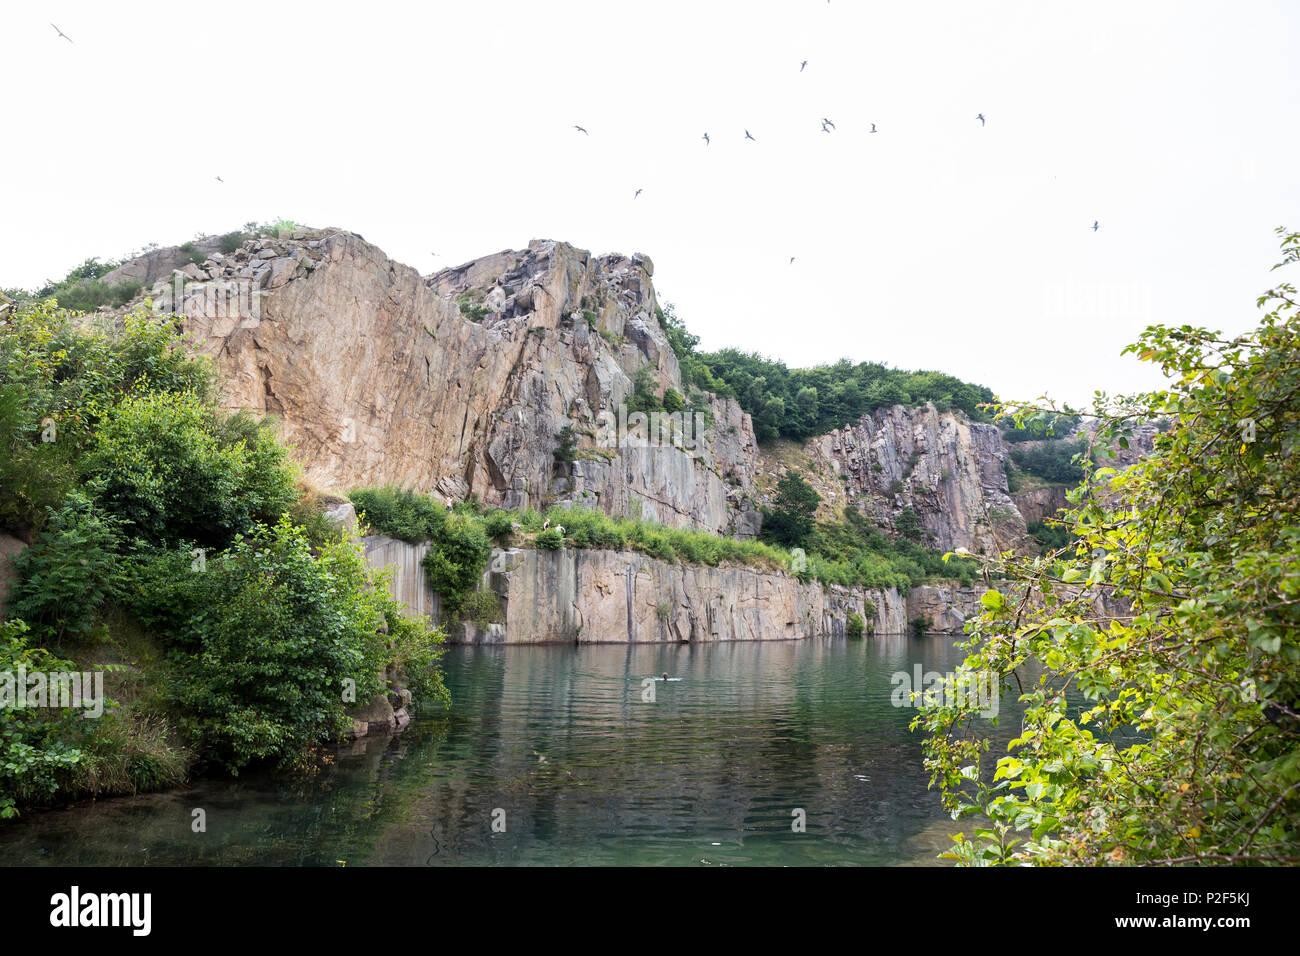 stone quarry Hammerso, lake and climbing area, Baltic sea, Bornholm, near Sandvig, Denmark, Europe Stock Photo